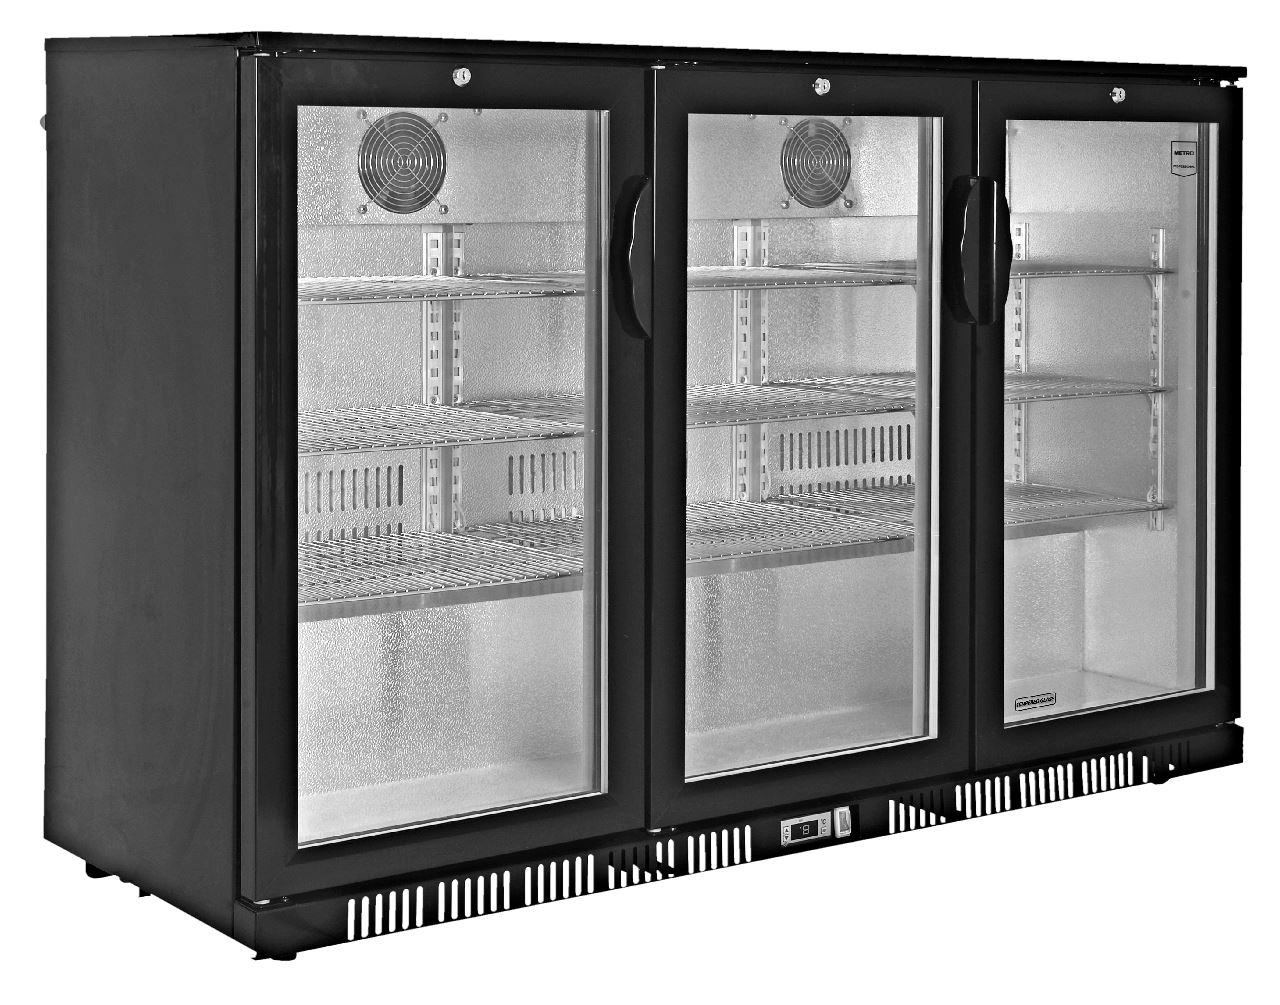 Gorenje R6193lx Kühlschrank : Metro professional gg gbc1003 flaschen kühlschrank kühl